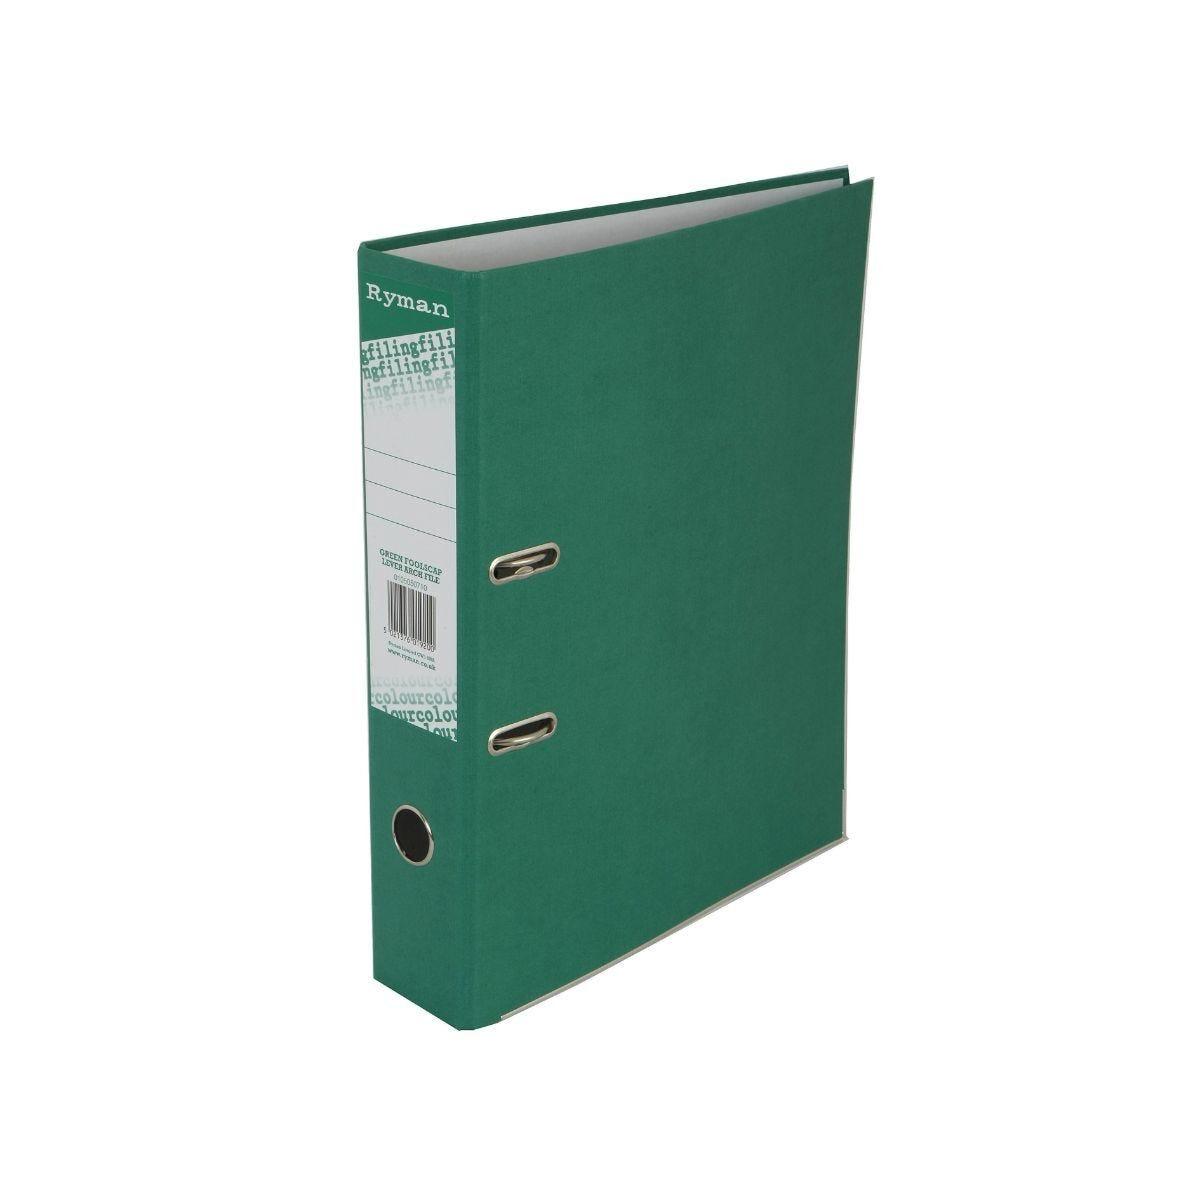 Ryman Colour Lever Arch File Foolscap Green